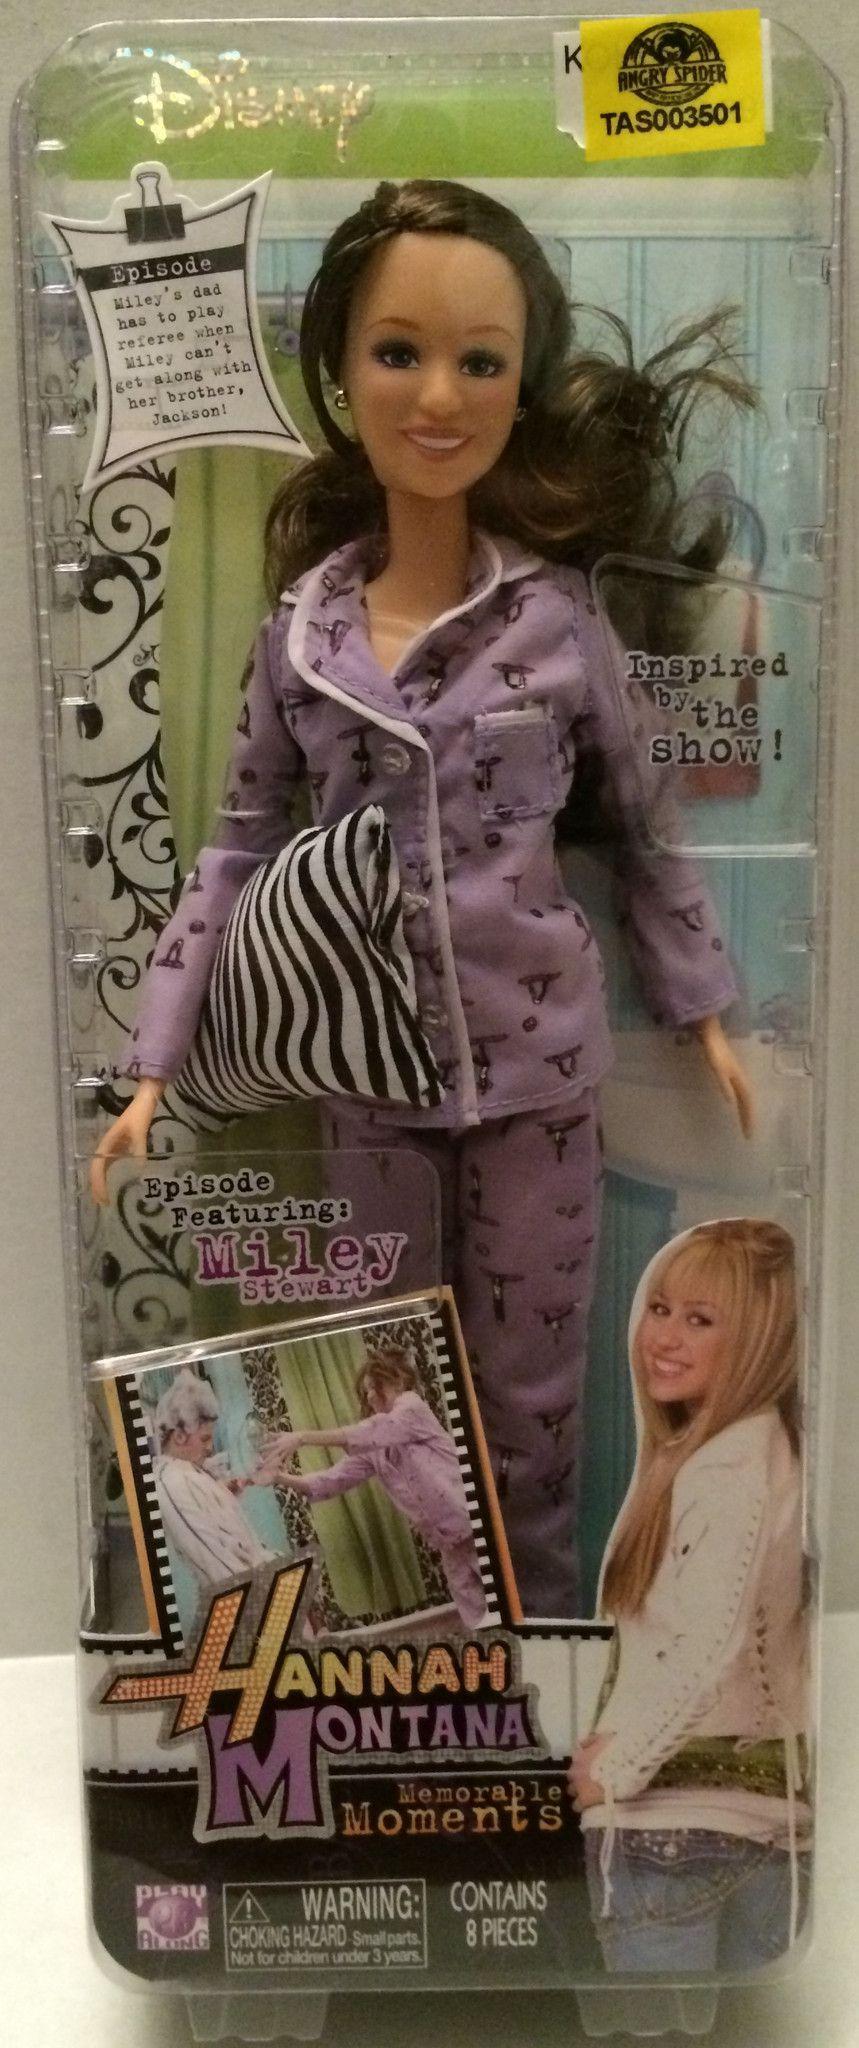 Jackson Hannah Montana Funny Moments : jackson, hannah, montana, funny, moments, TAS003501), Disney, Hannah, Montana, Memorable, Moments, Miley, Stewart, Funny, Memes,, Stewart,